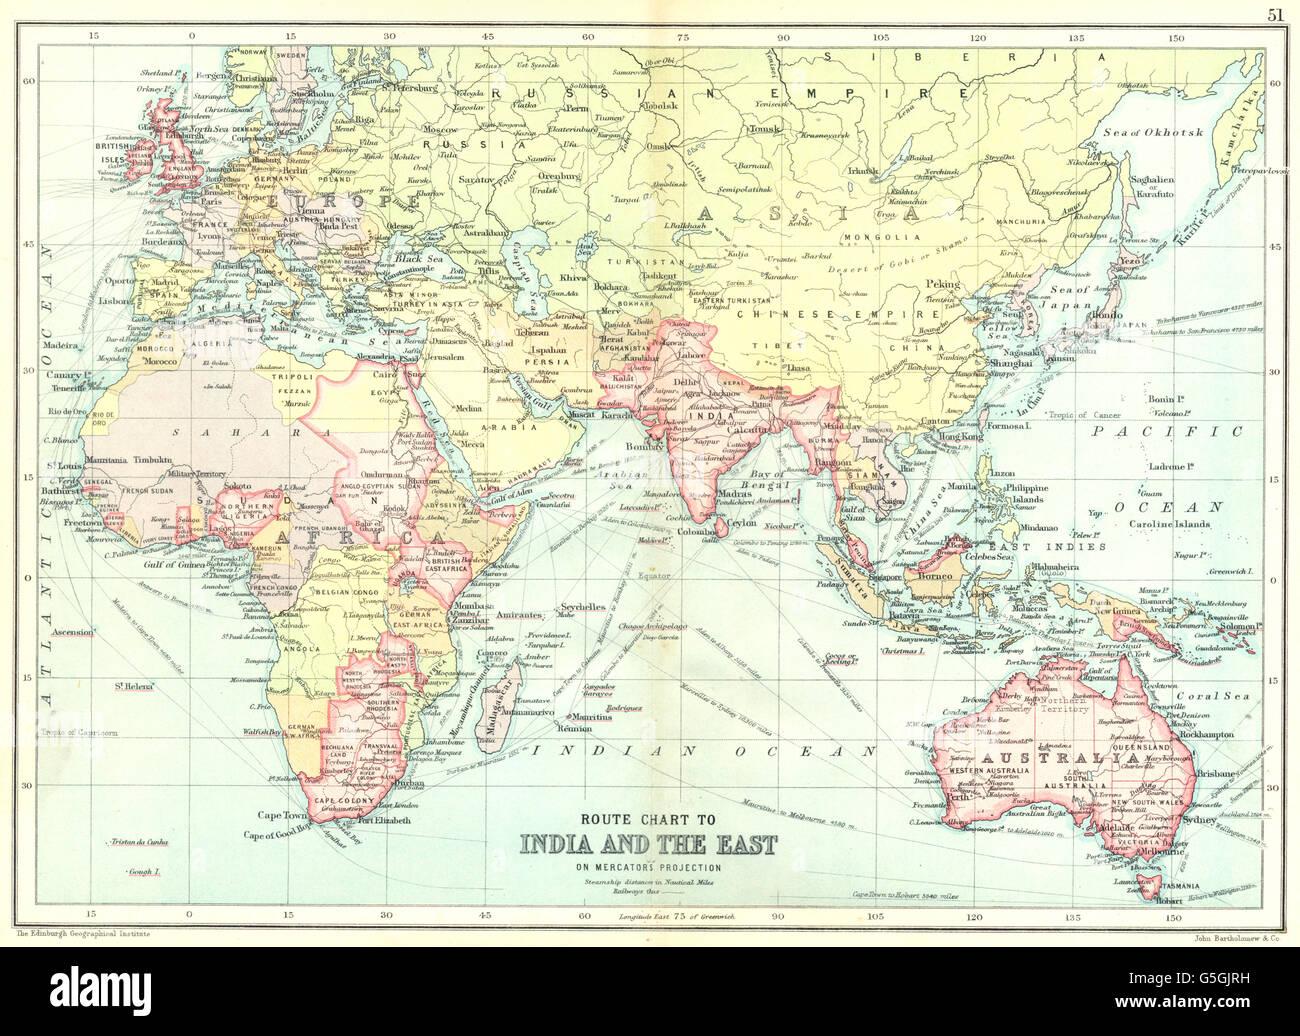 Australia India Map.British Empire Route Chart To India Far East Australia New Stock